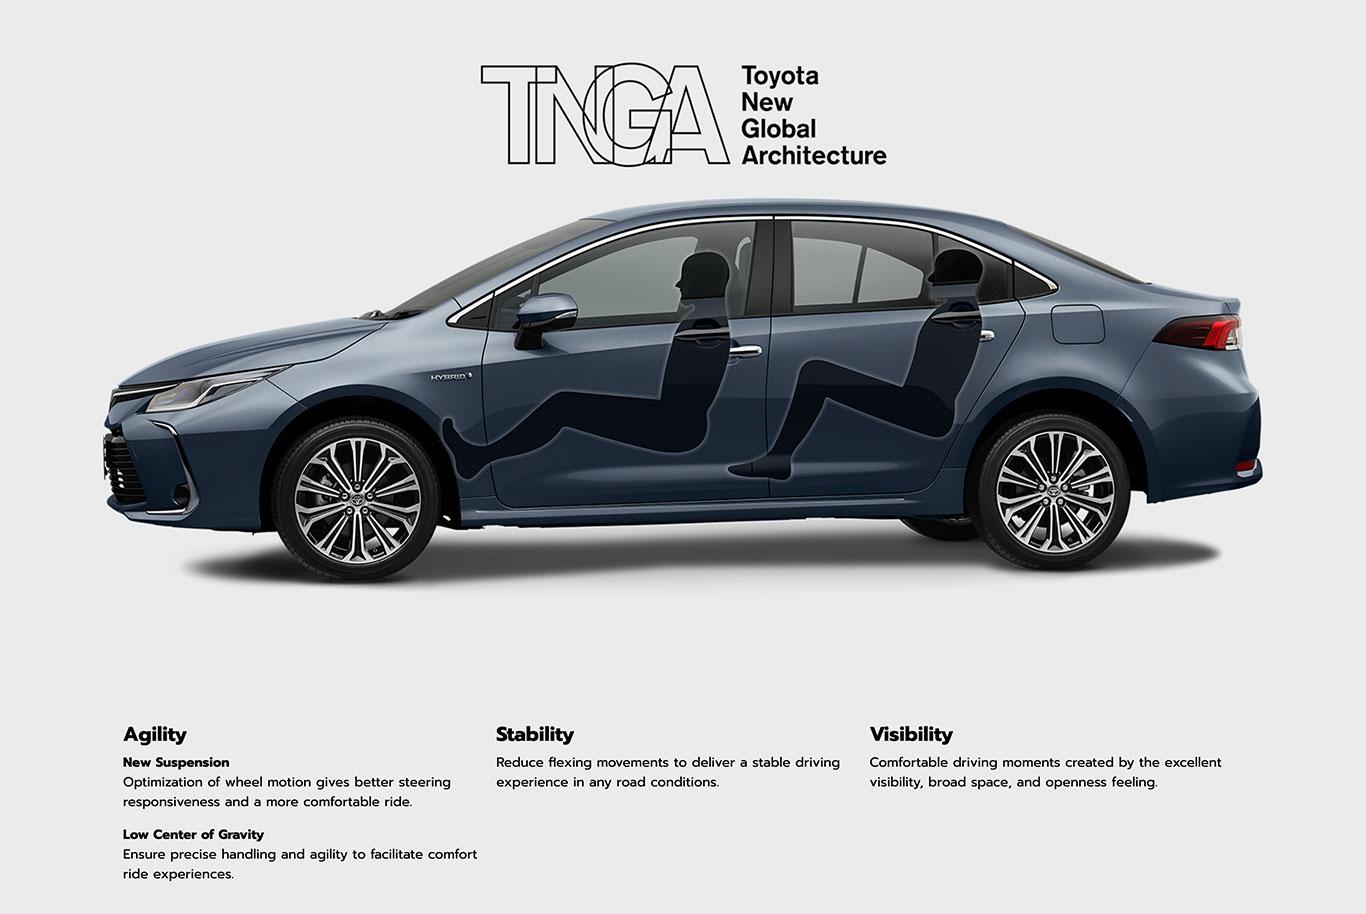 toyota-altis-hybrid-performance-features-1